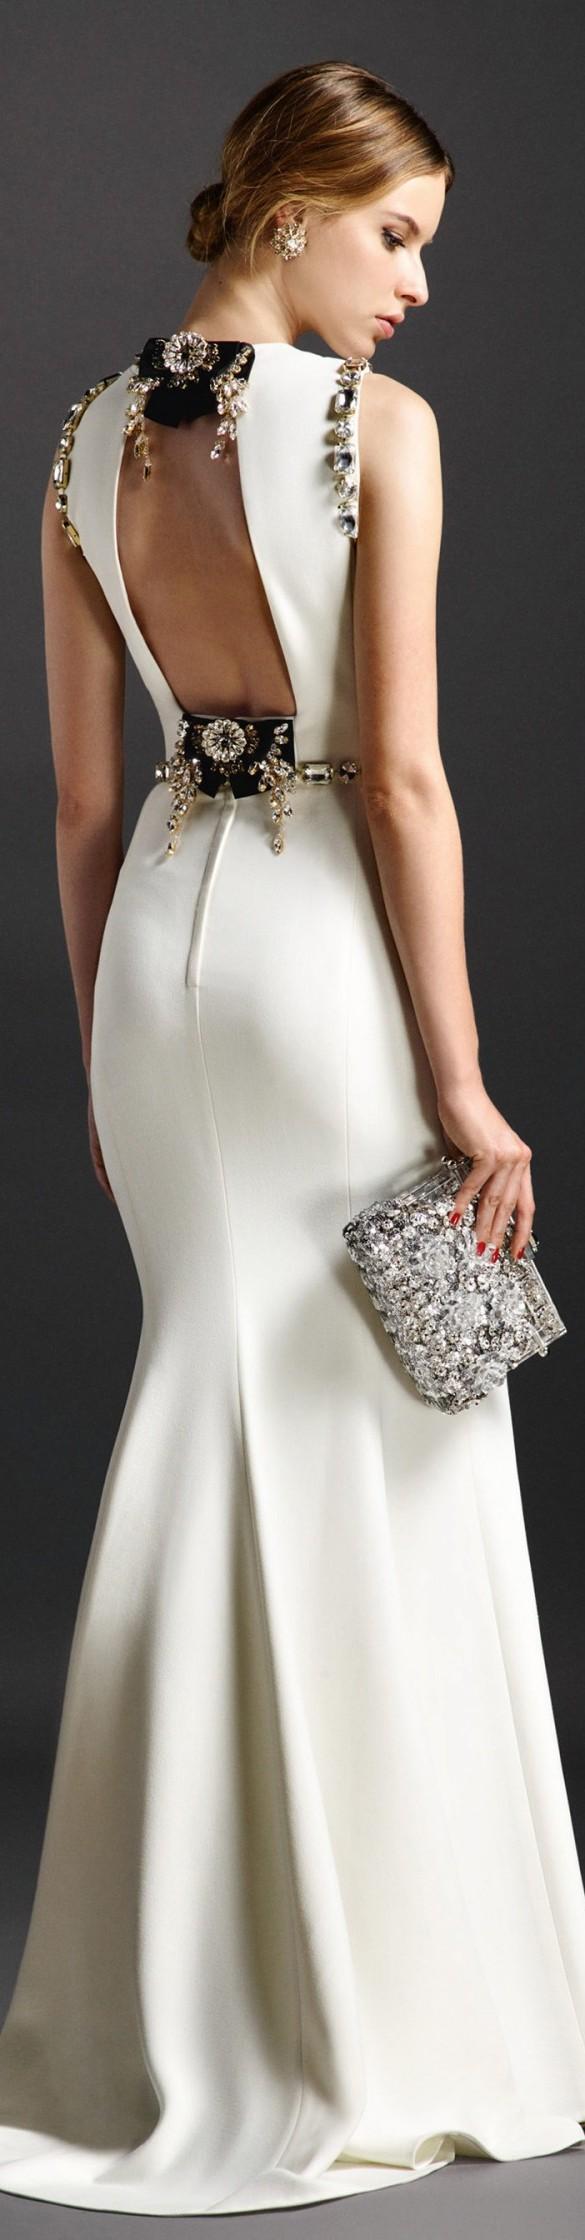 Dolce gabbana spring 2016 divine dresses pinterest for Dolce and gabbana wedding dresses